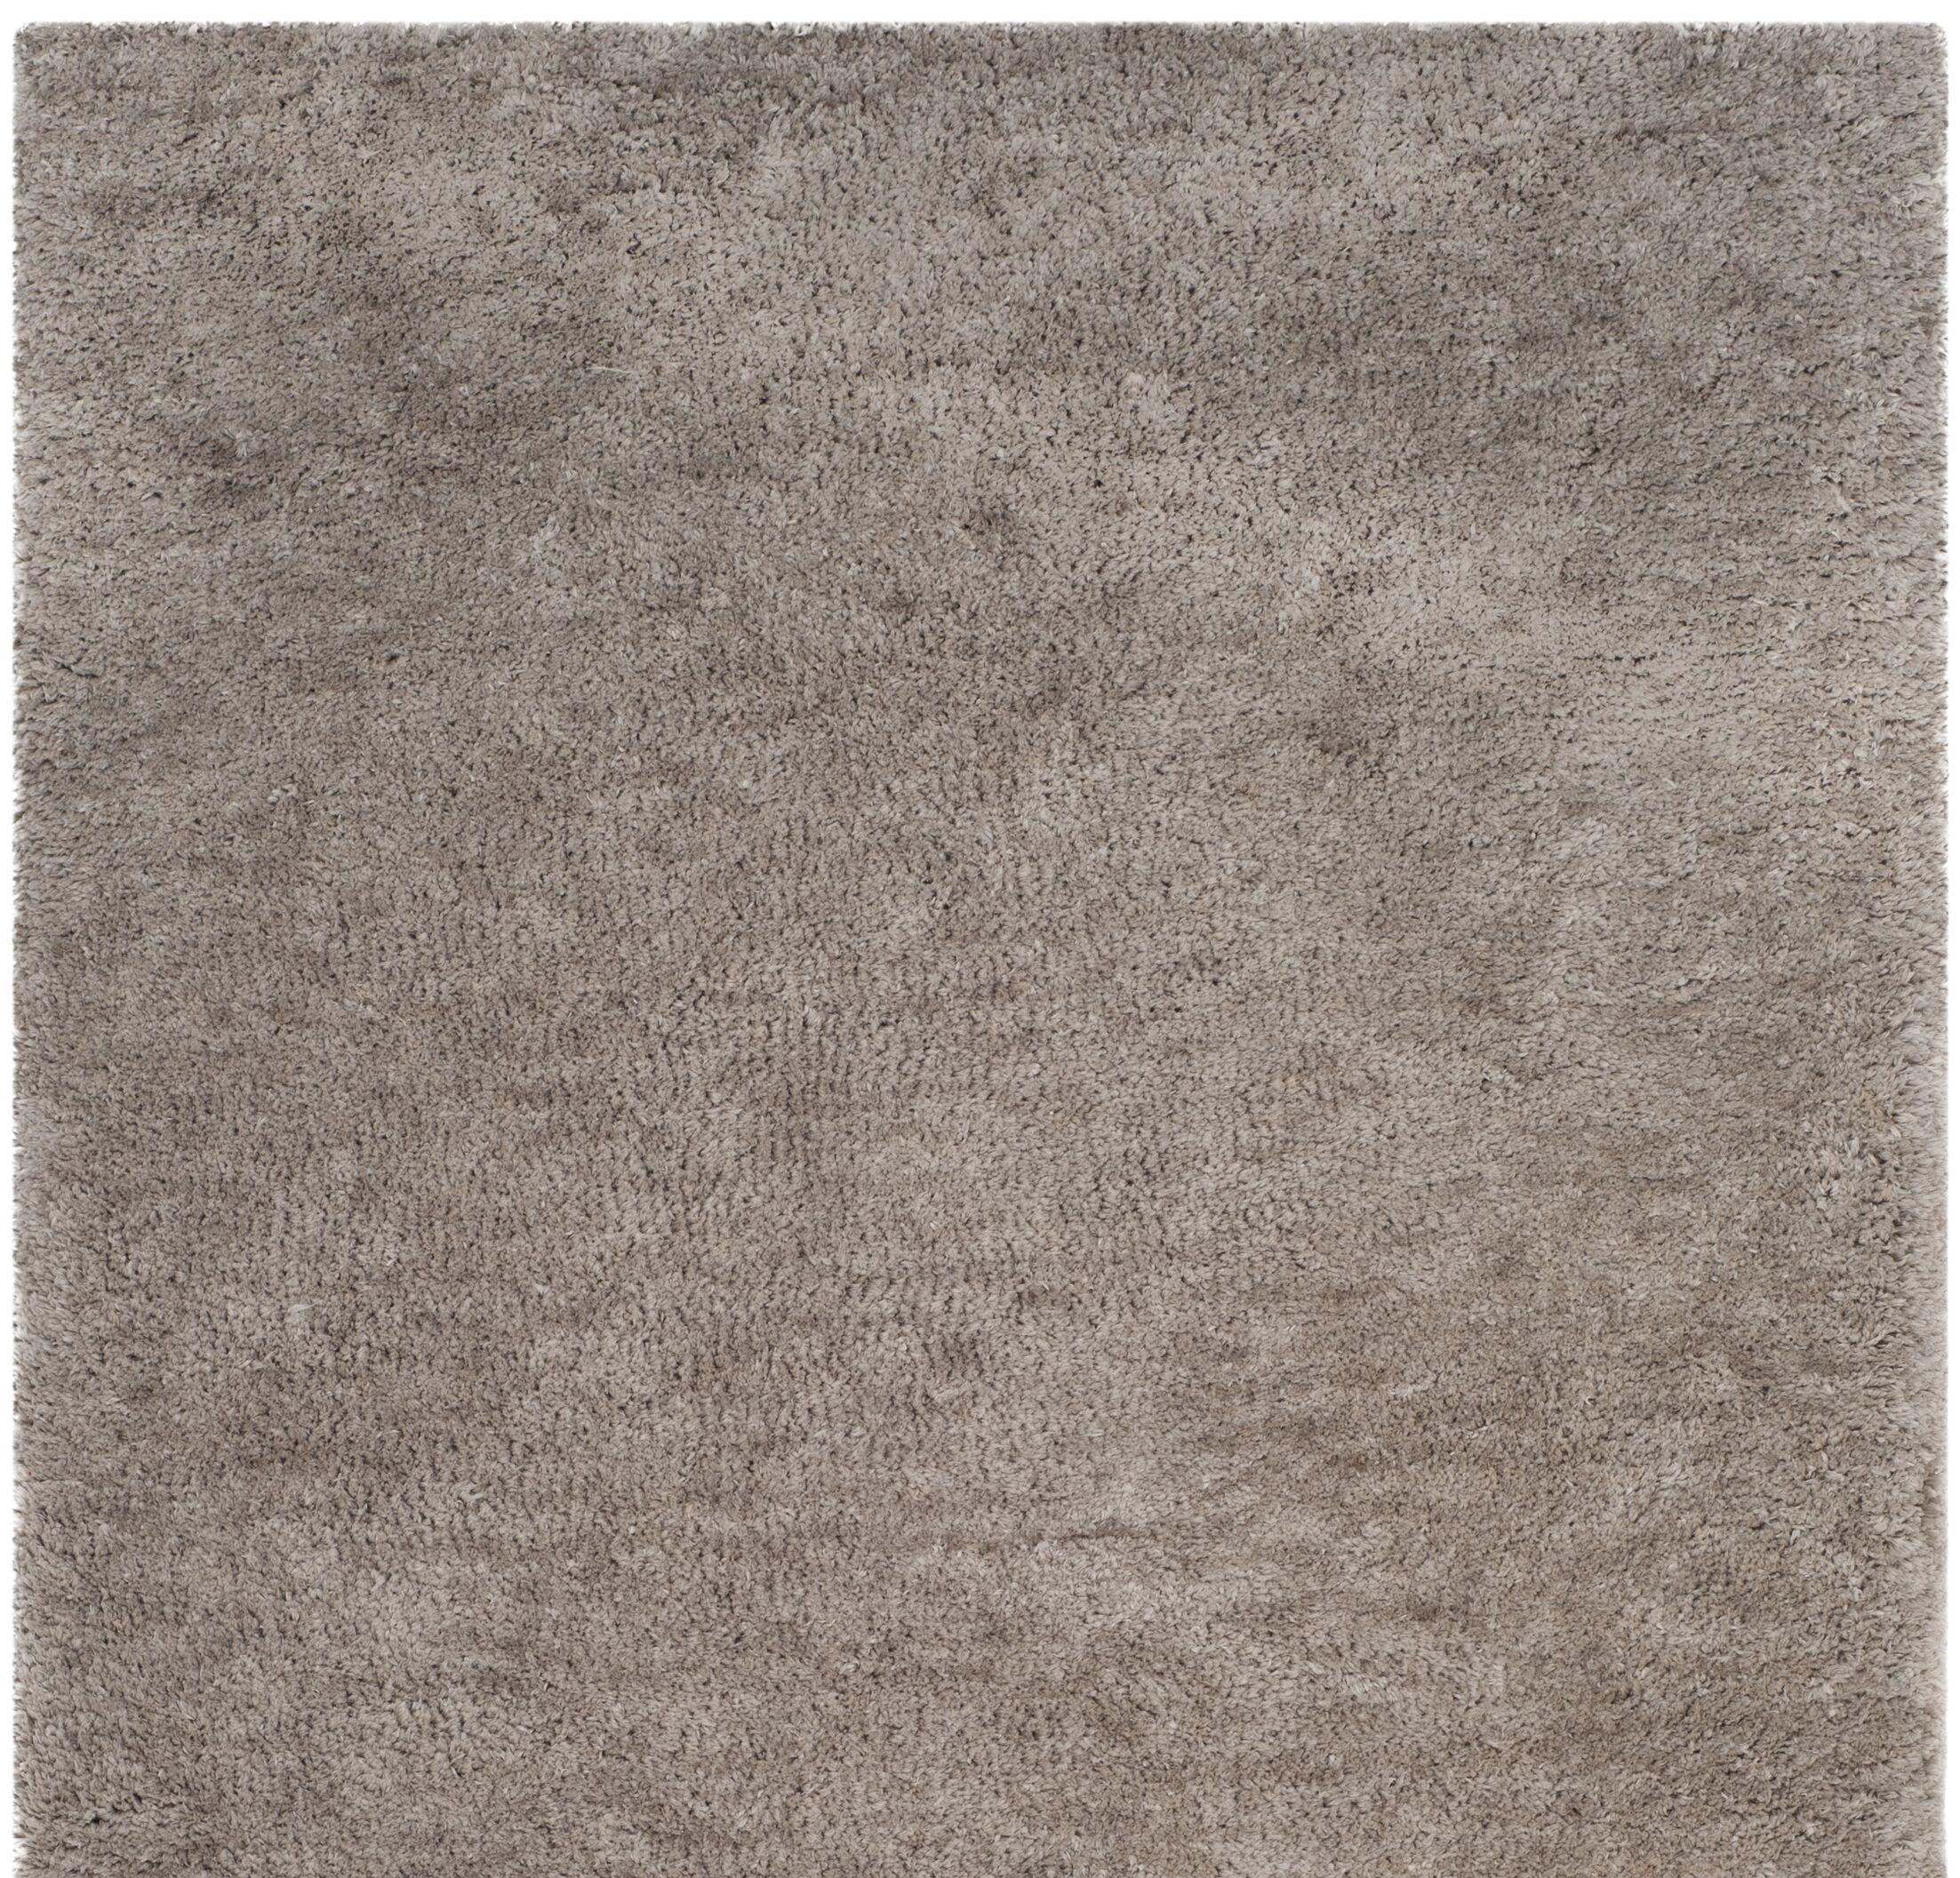 Detweiler Hand-Tufted Gray Area Rug Rug Size: Round 6'